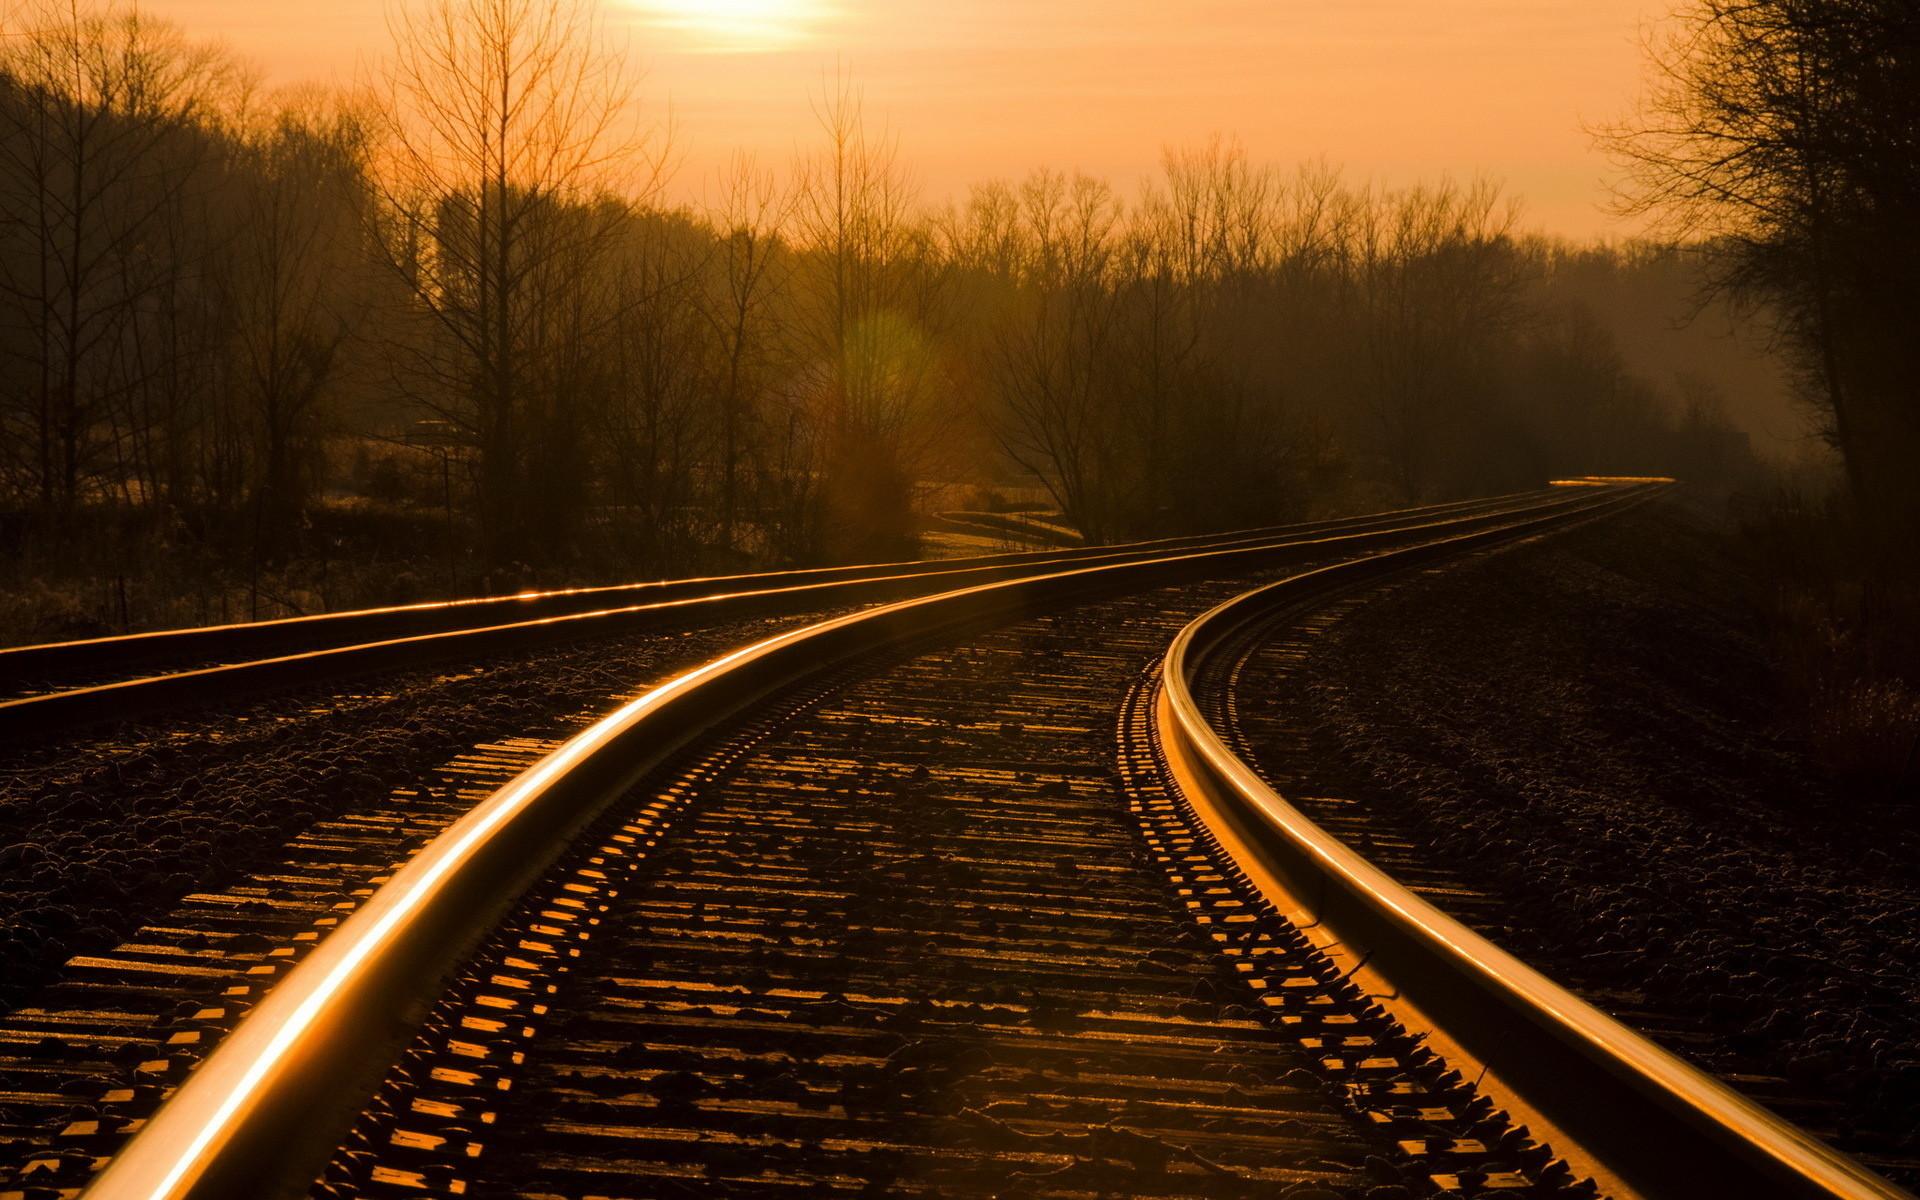 Trains railroad tracks